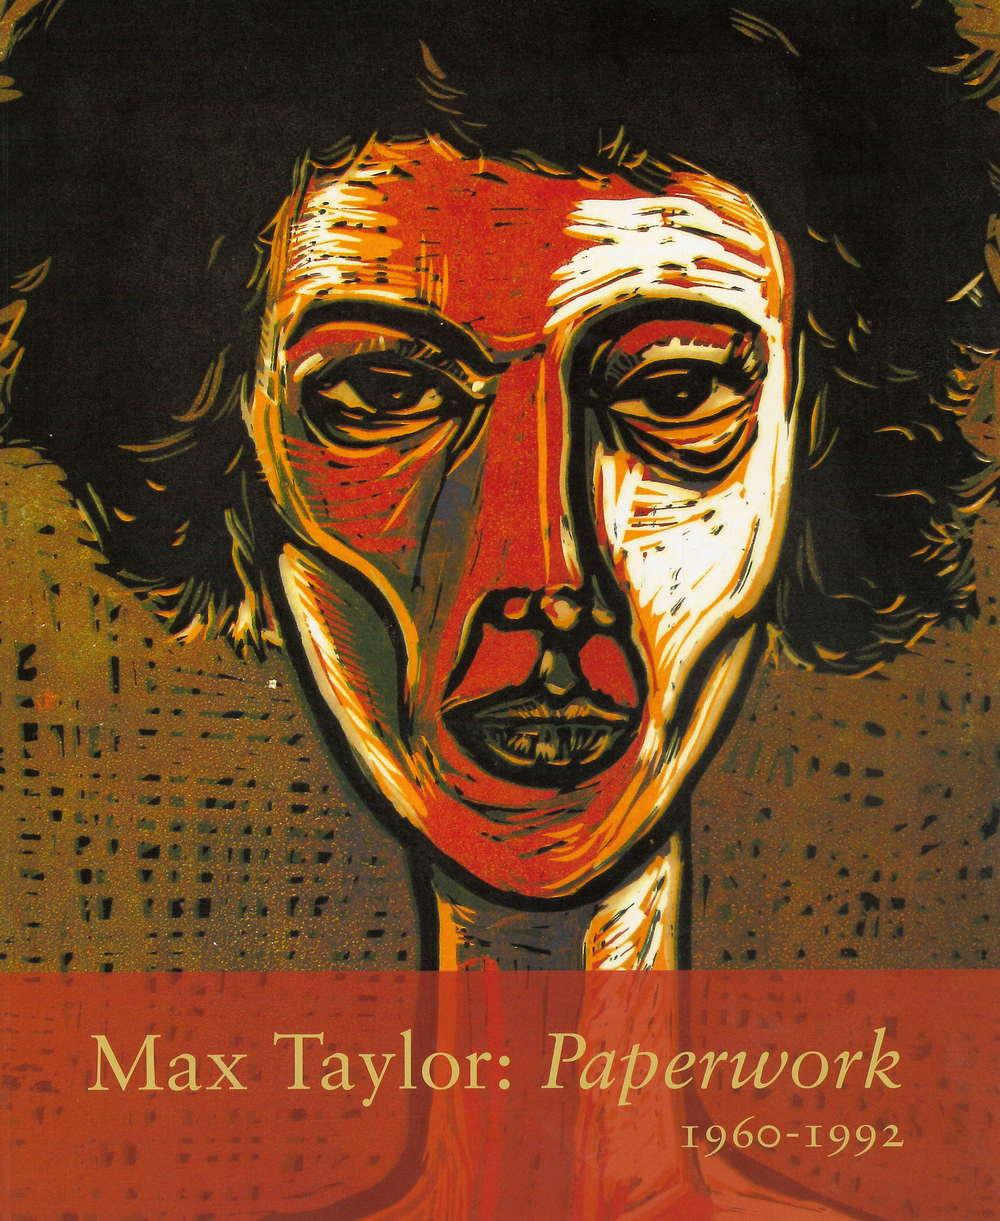 maxtaylor_paperwork.jpg